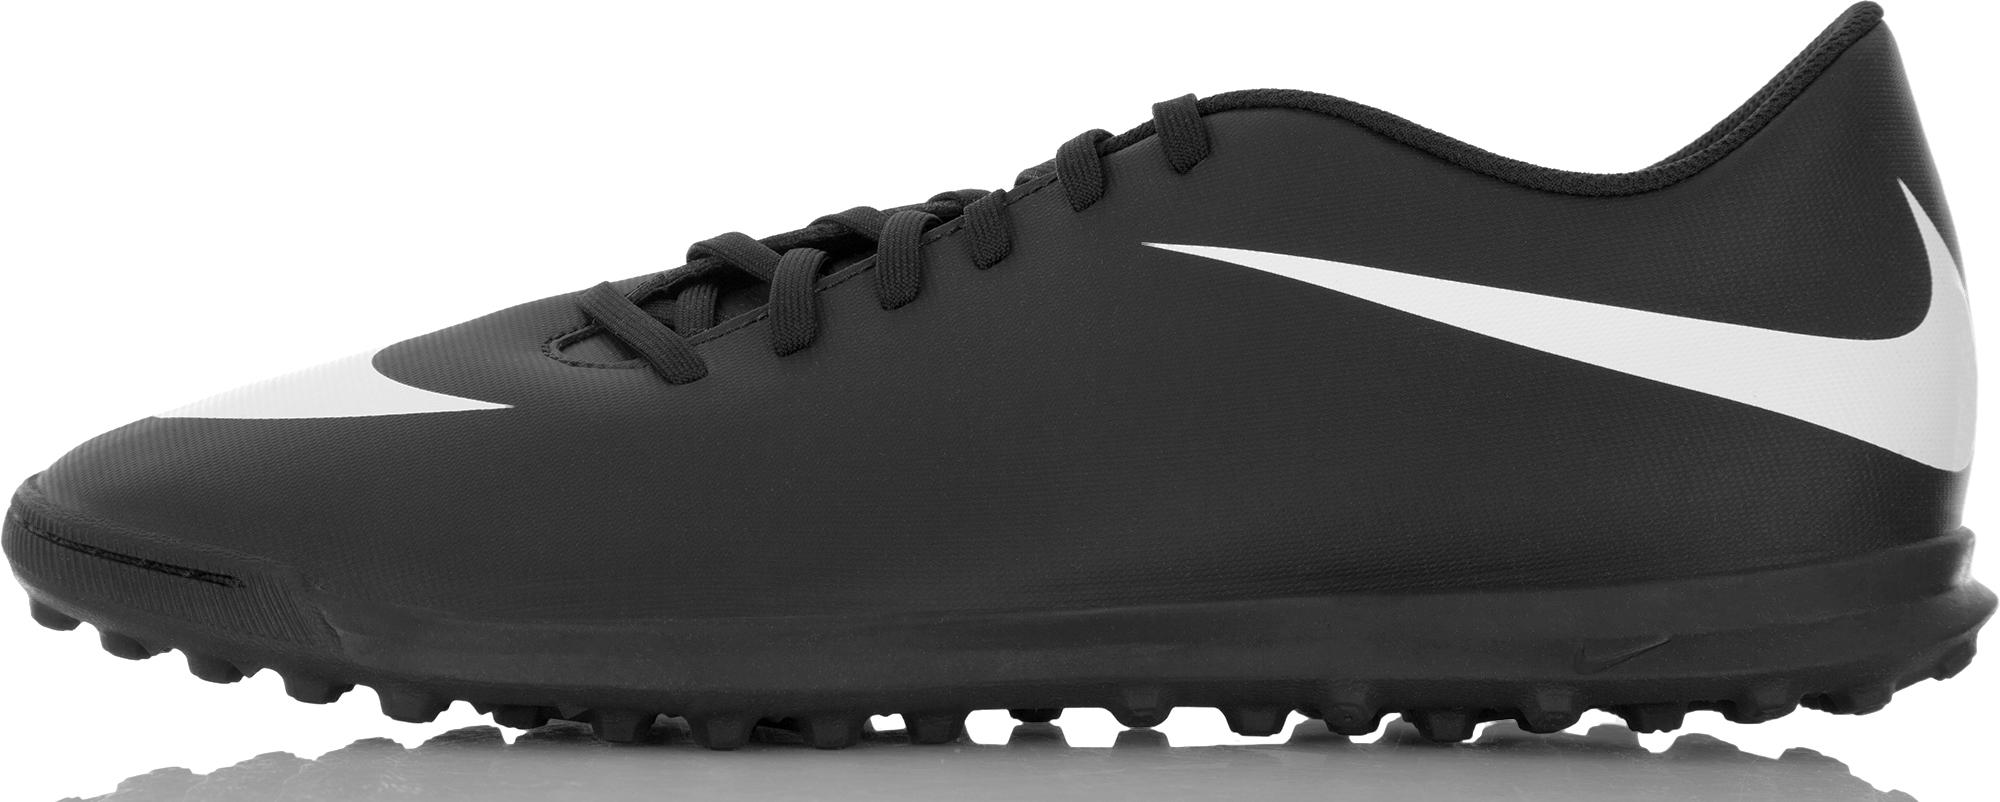 Nike Бутсы мужские Nike Bravatax II TF, размер 45